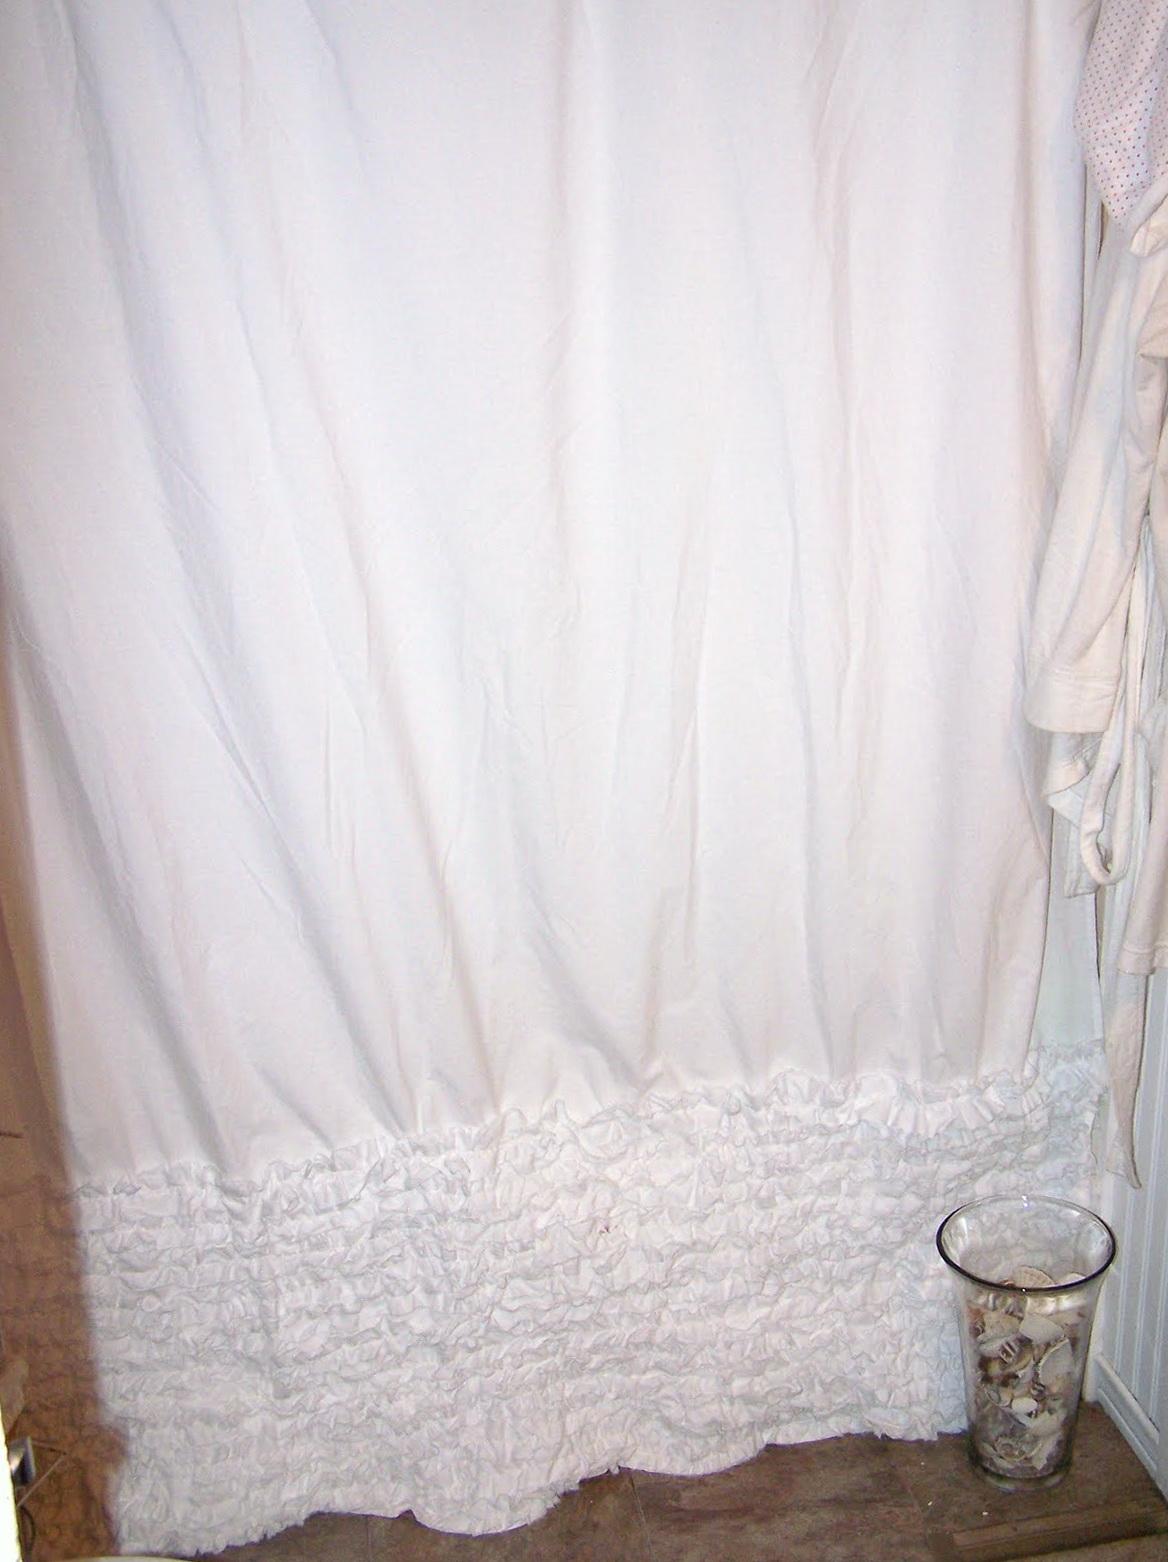 White Ruffle Shower Curtain Anthropologie | Home Design Ideas